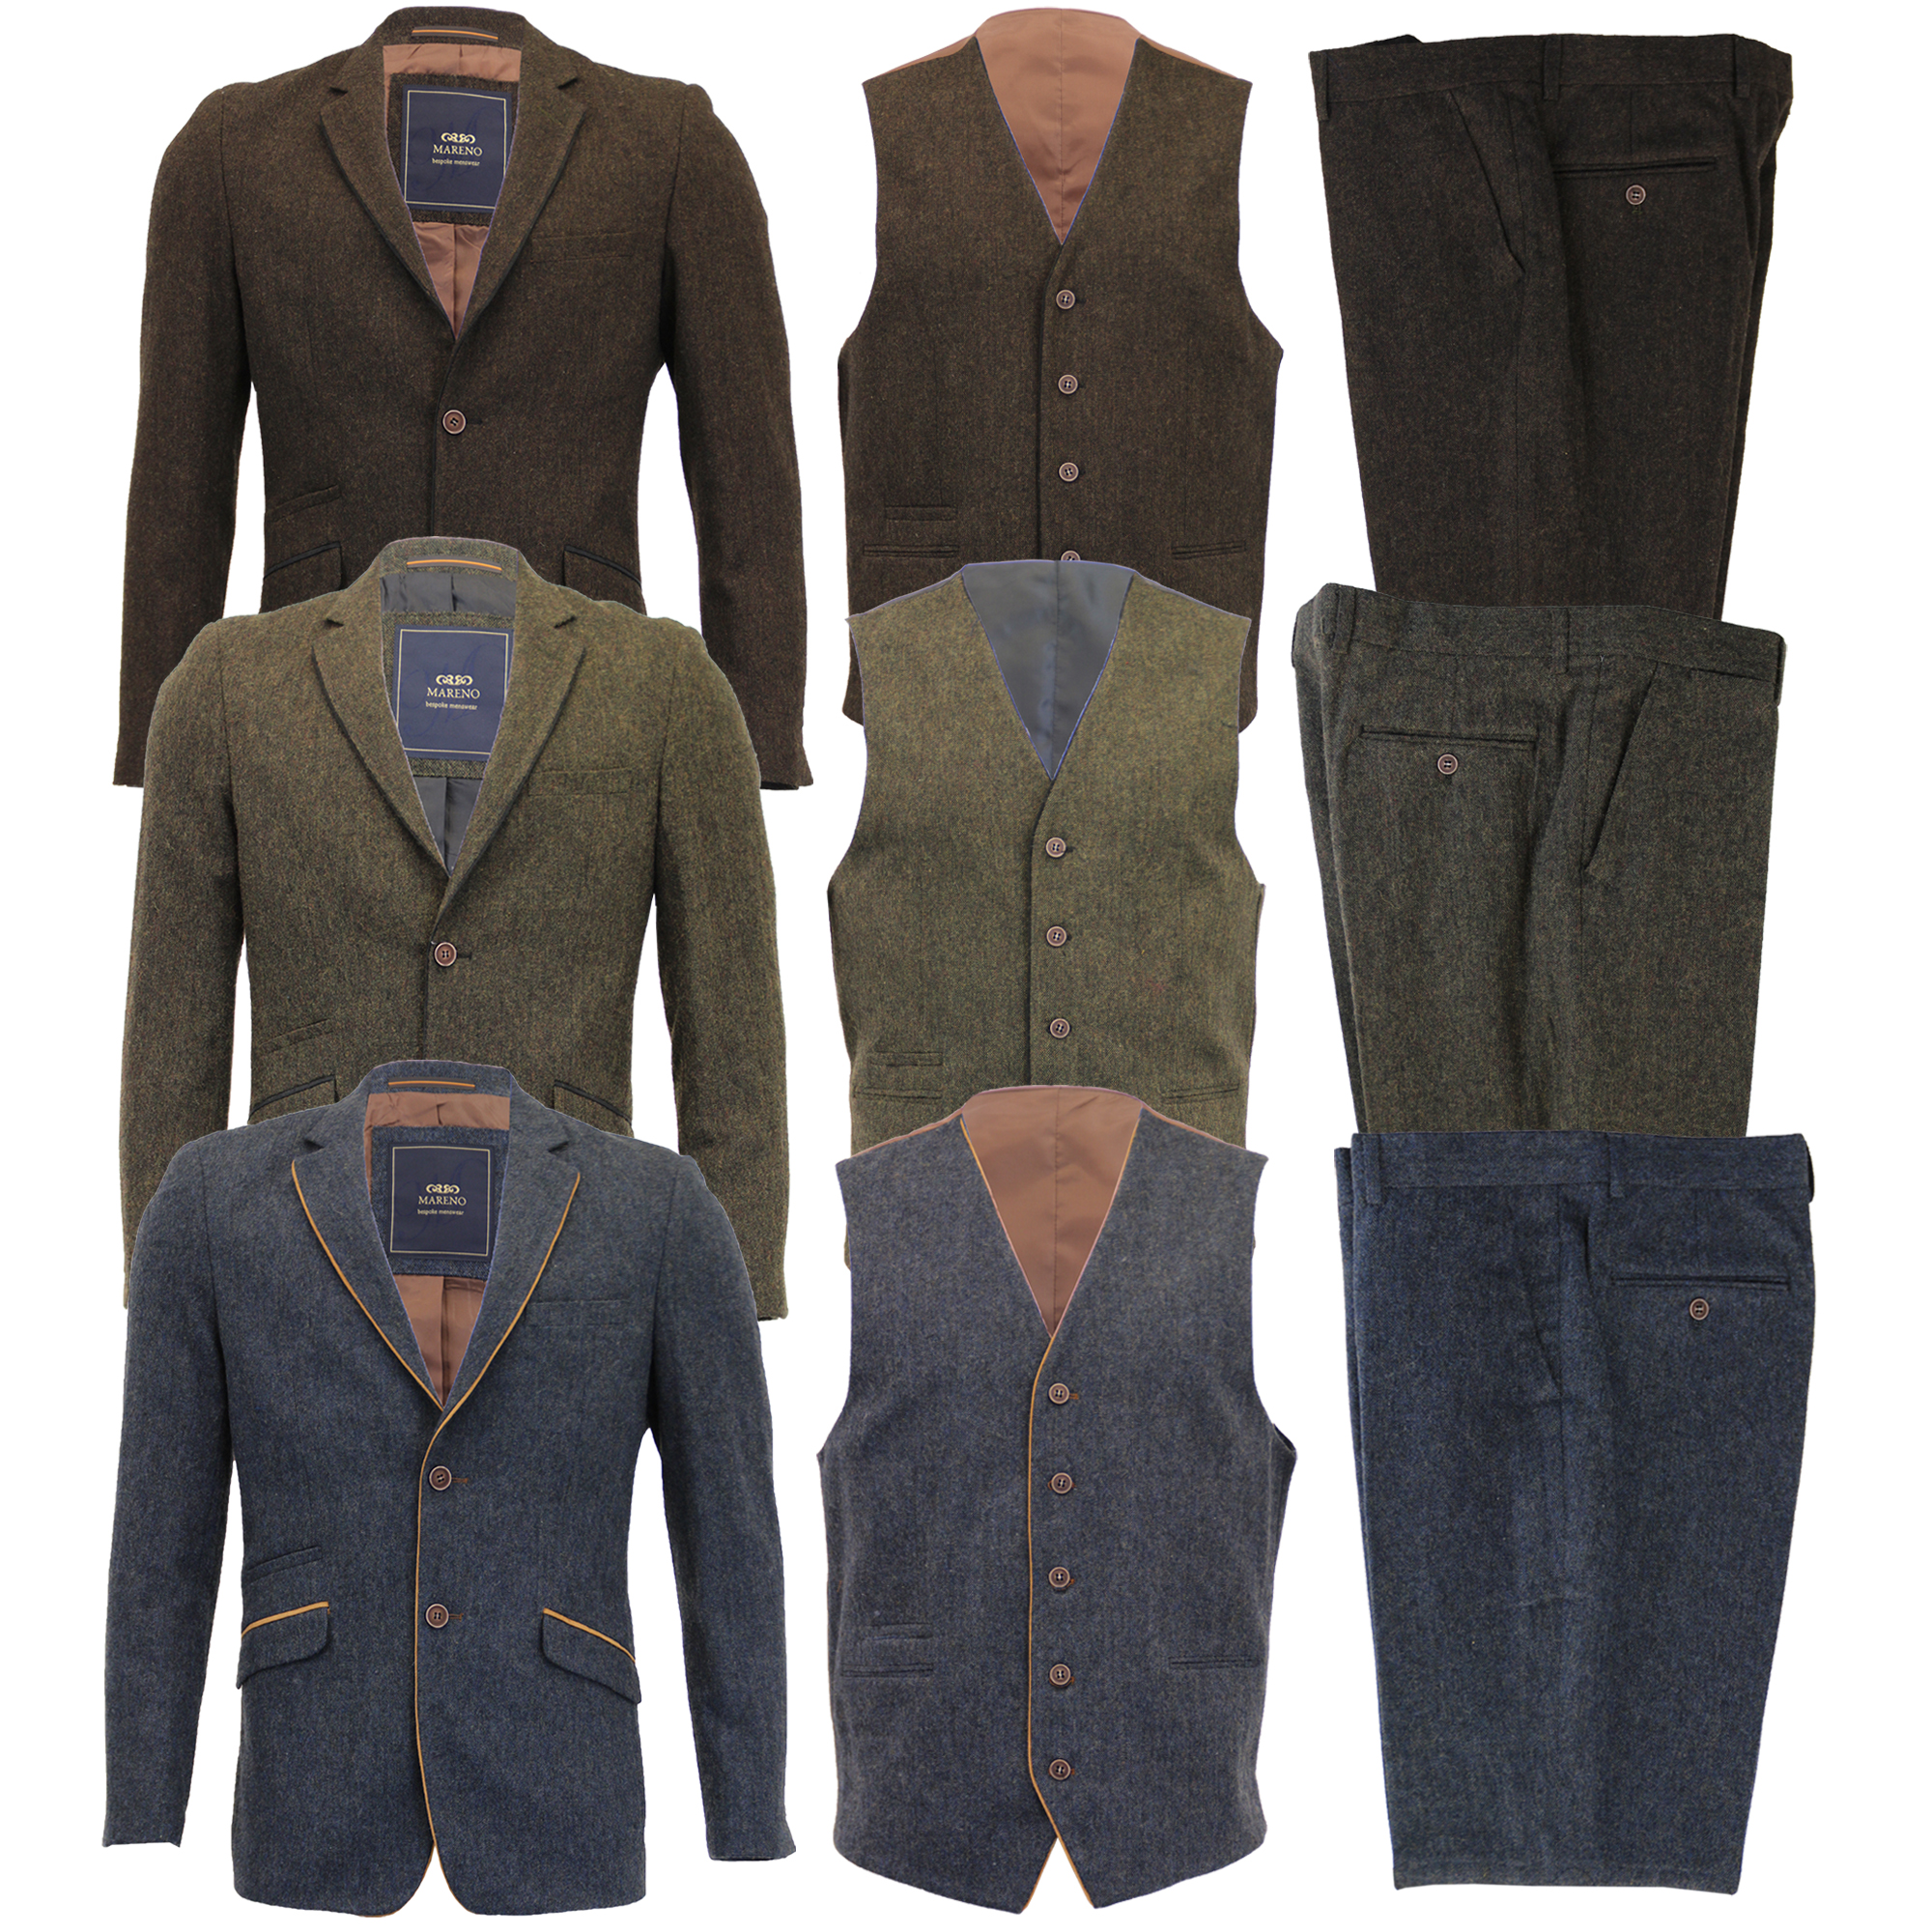 Mezcla-de-lana-para-hombre-3-piezas-trajes-mareno-Blazer-Chaqueta-pantalones-chaleco-Fiesta-Formal miniatura 5